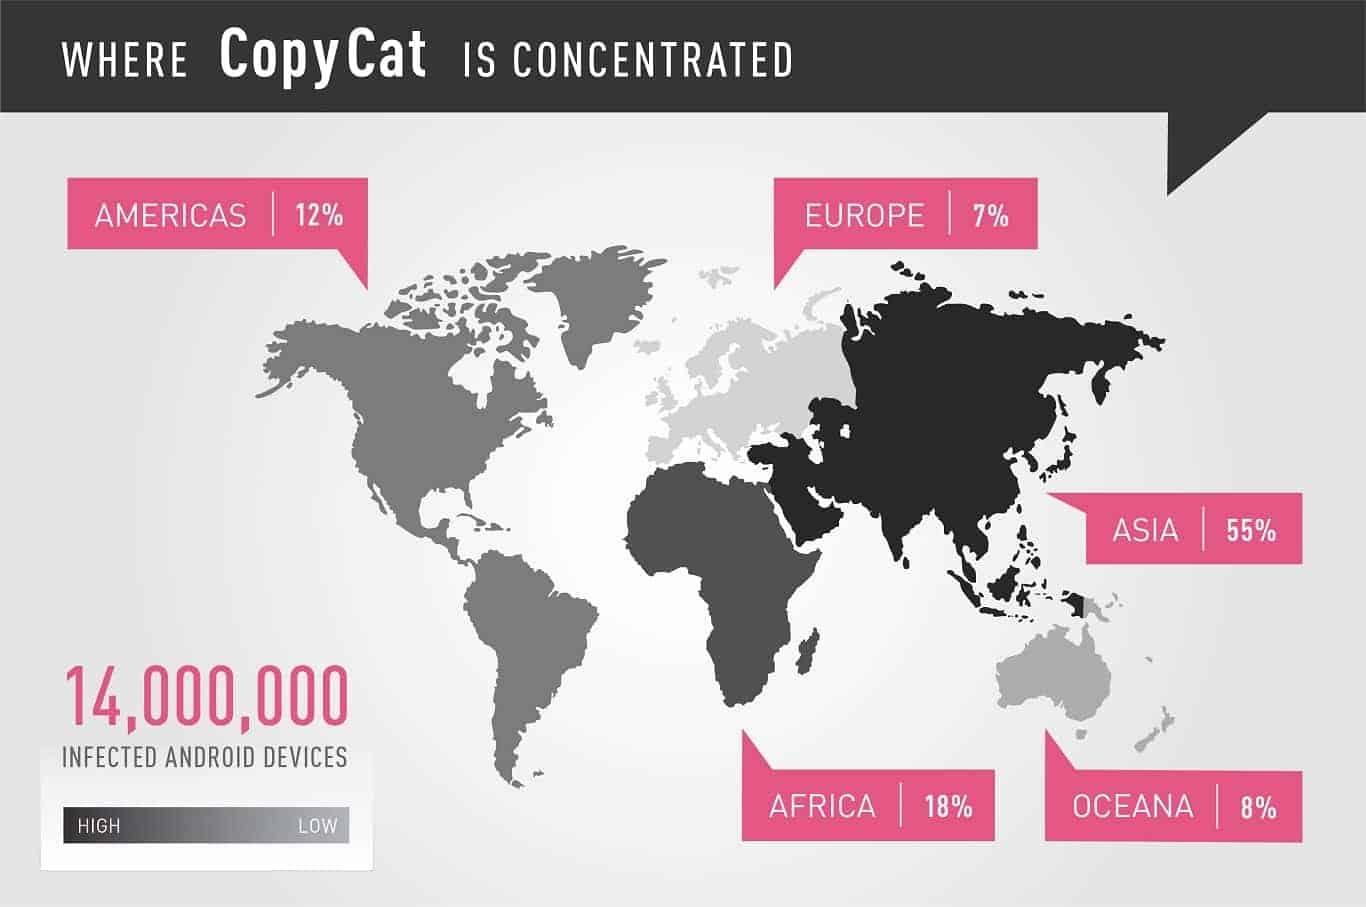 CopyCat Malware Device Concentration